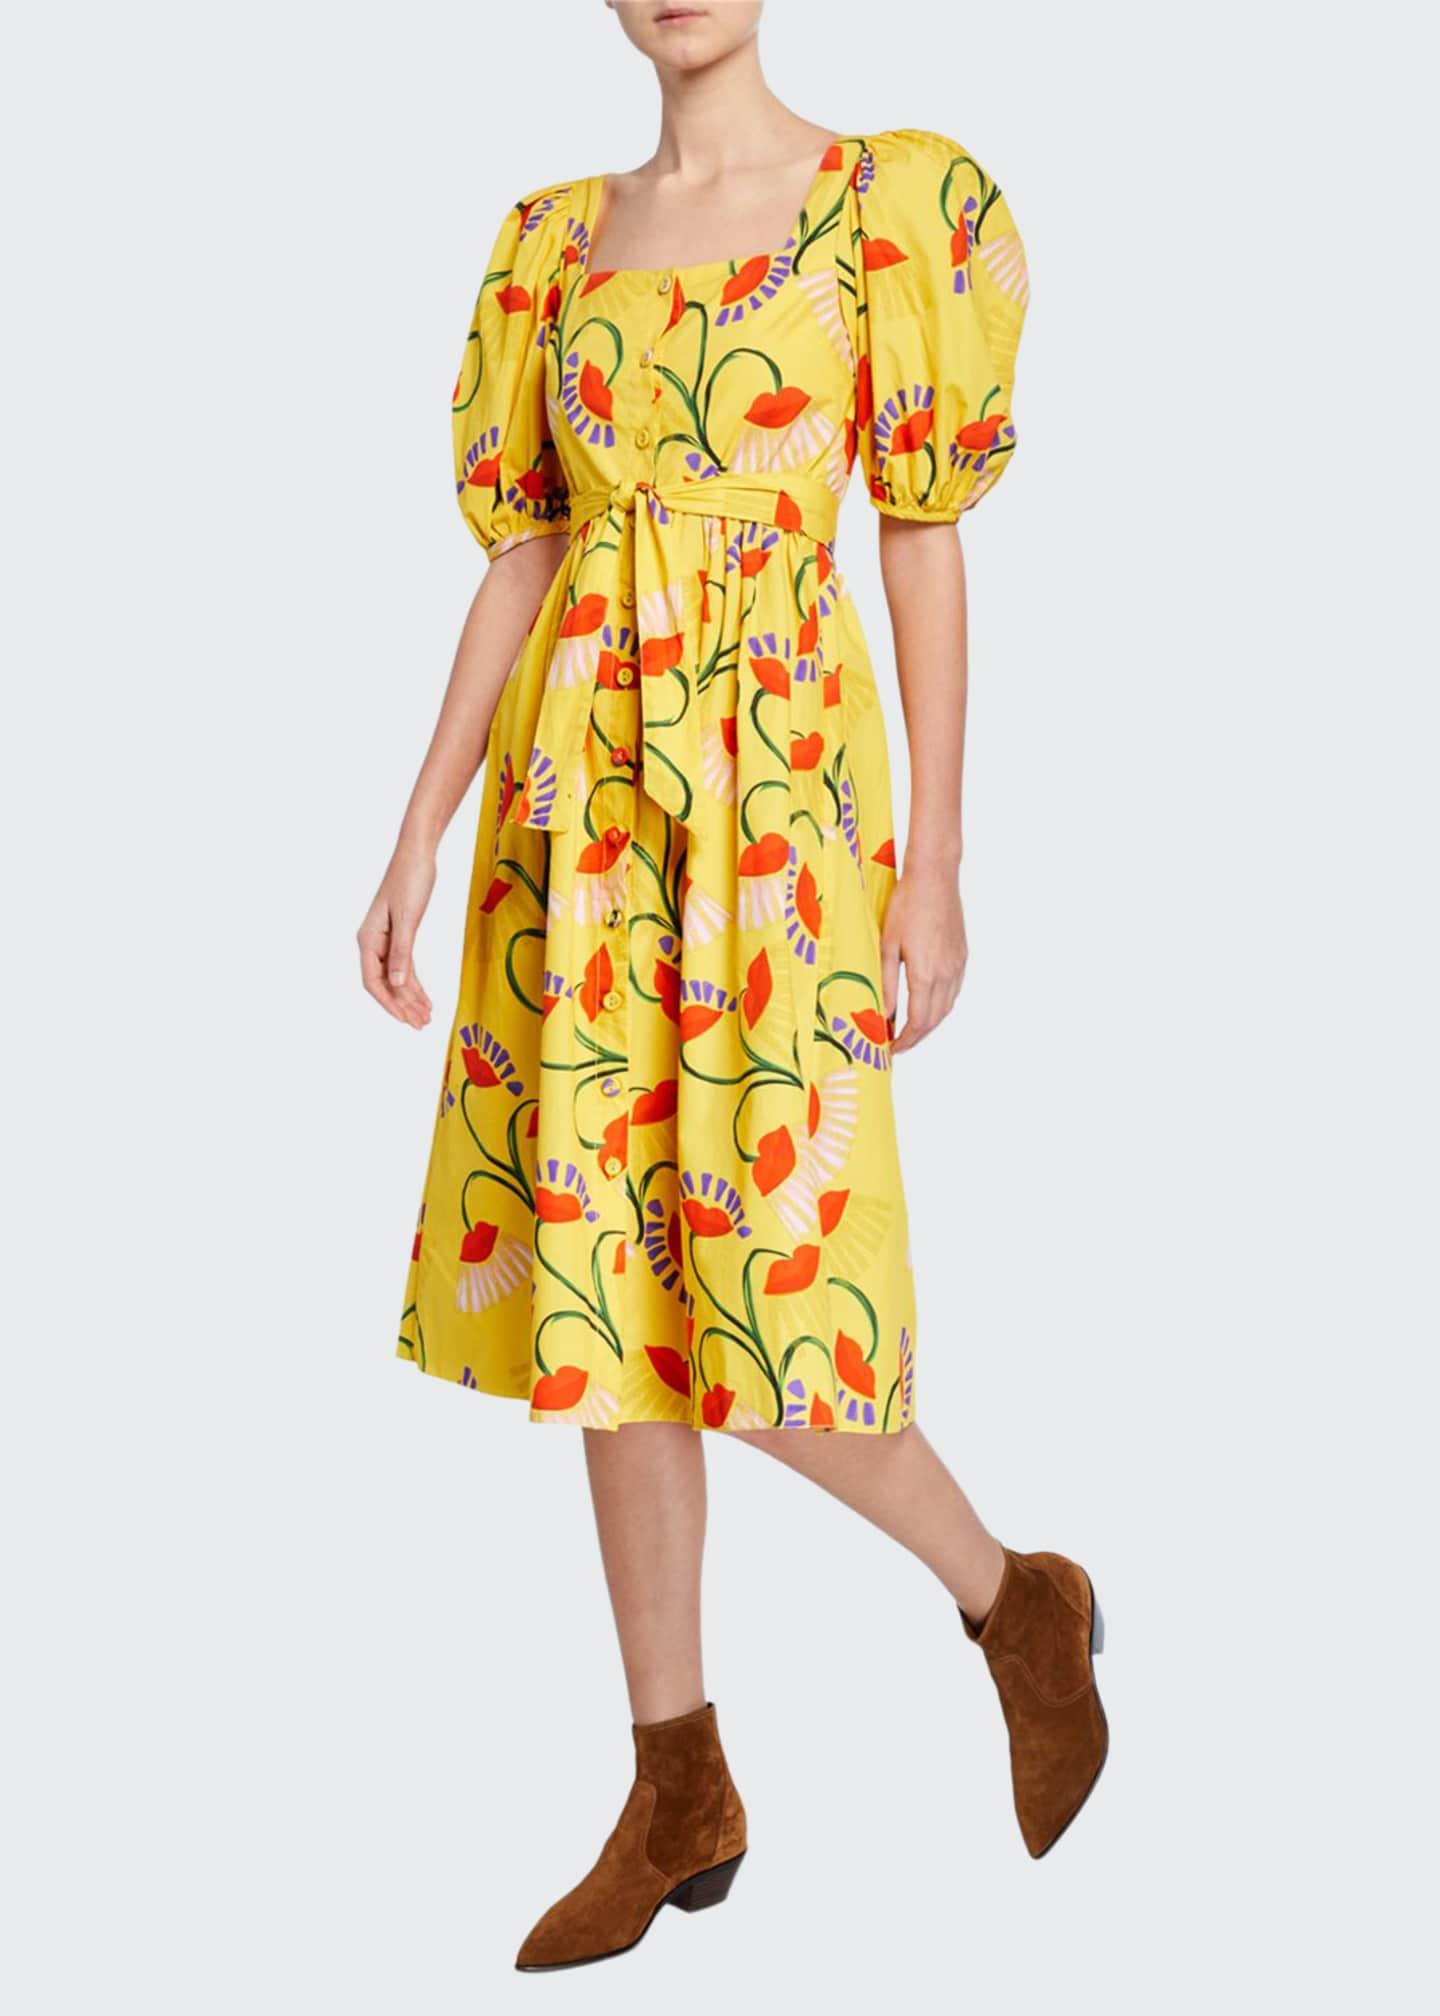 Borgo de Nor Corin Puff-Sleeve Floral-Print Poplin Dress